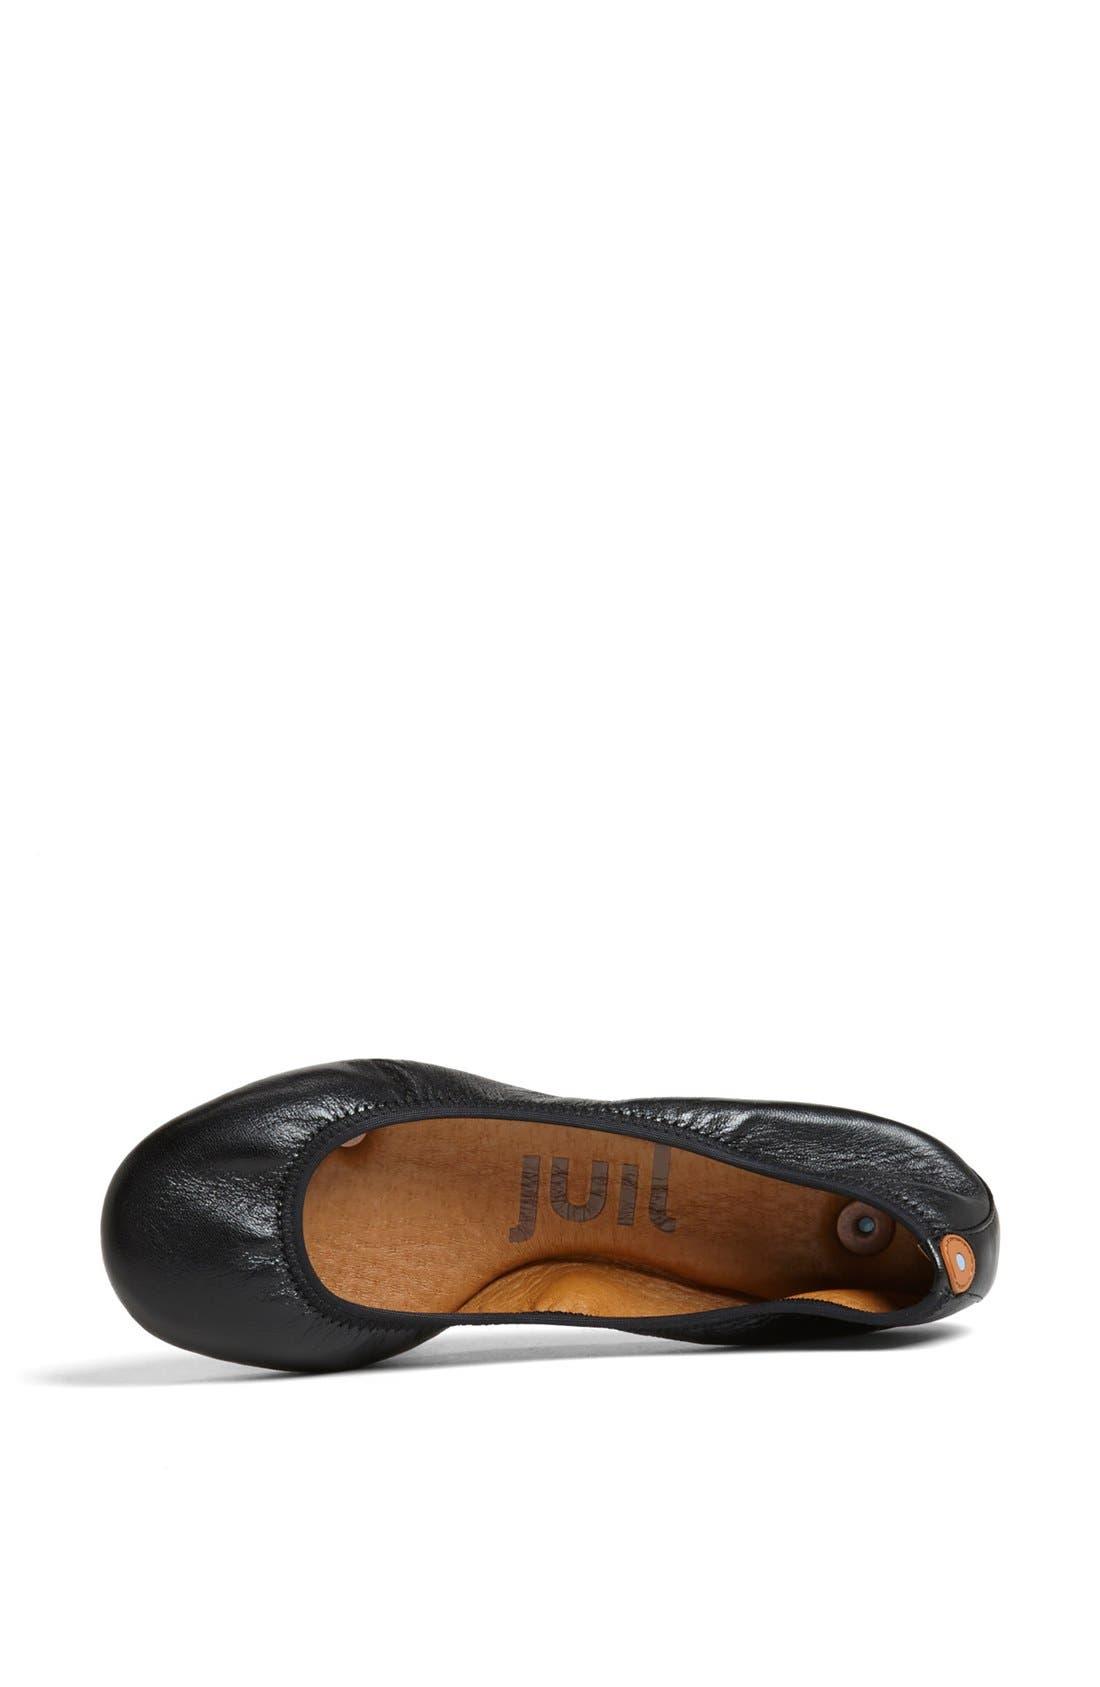 Alternate Image 3  - Juil 'The Flat' Earthing Leather Ballet Flat